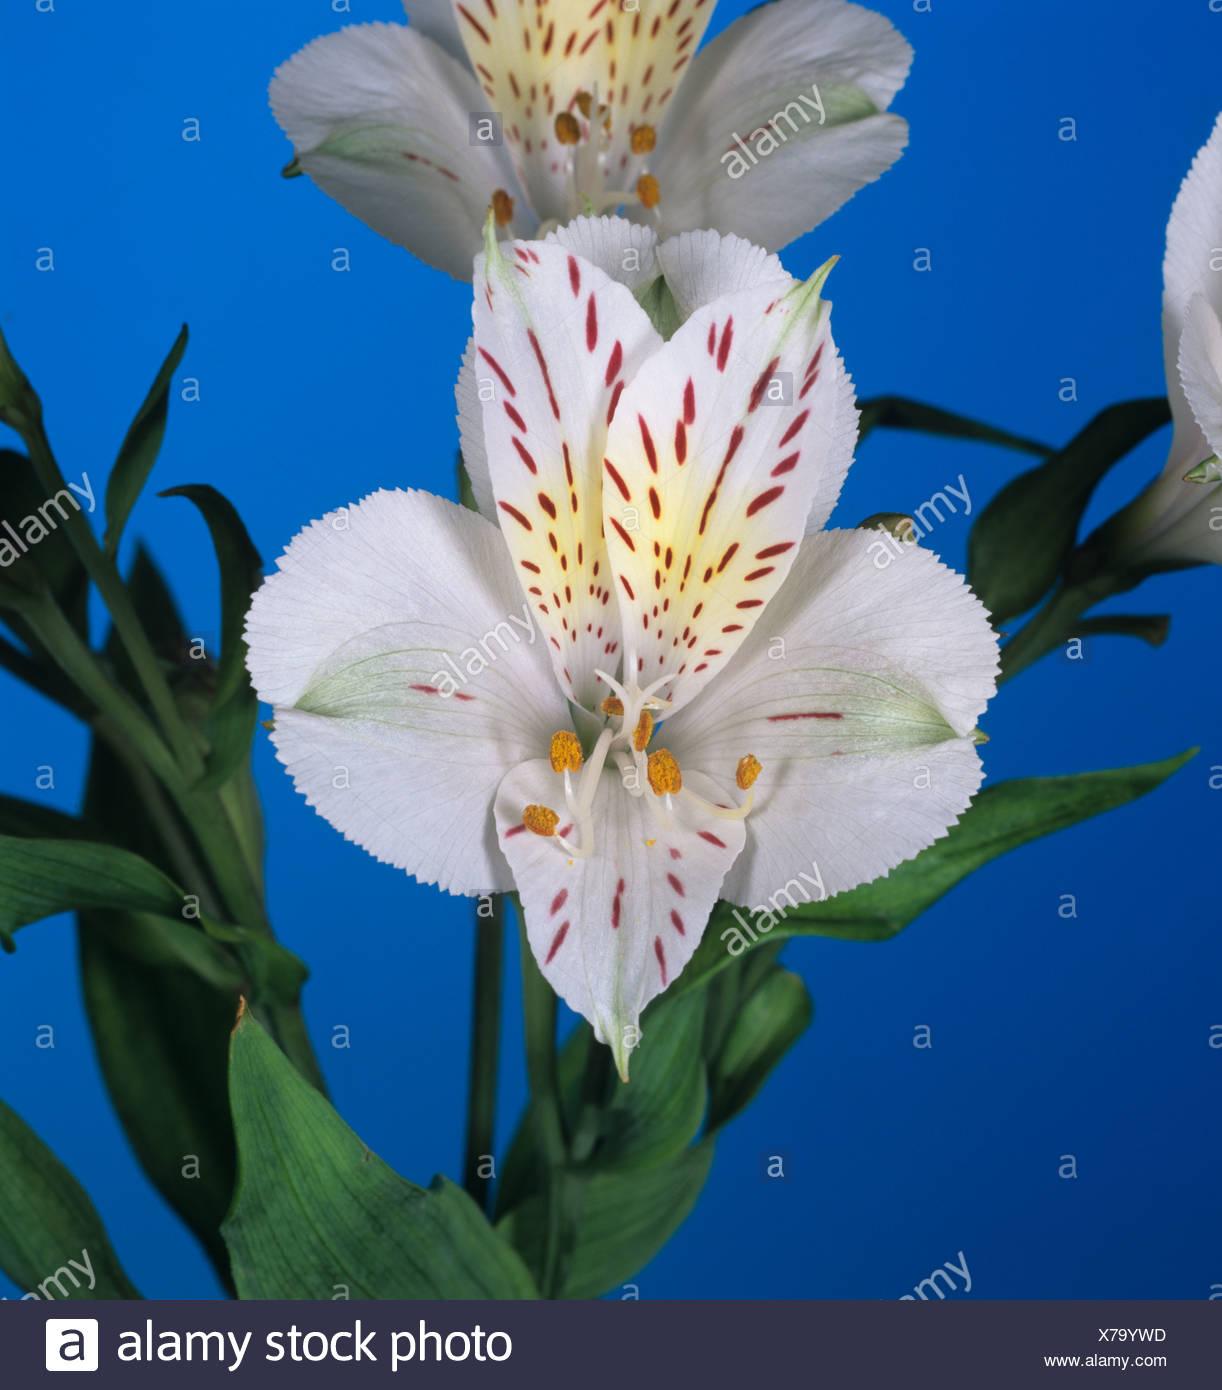 Flower of a peruvian lily alstroemeria spp portrait stock photo flower of a peruvian lily alstroemeria spp portrait izmirmasajfo